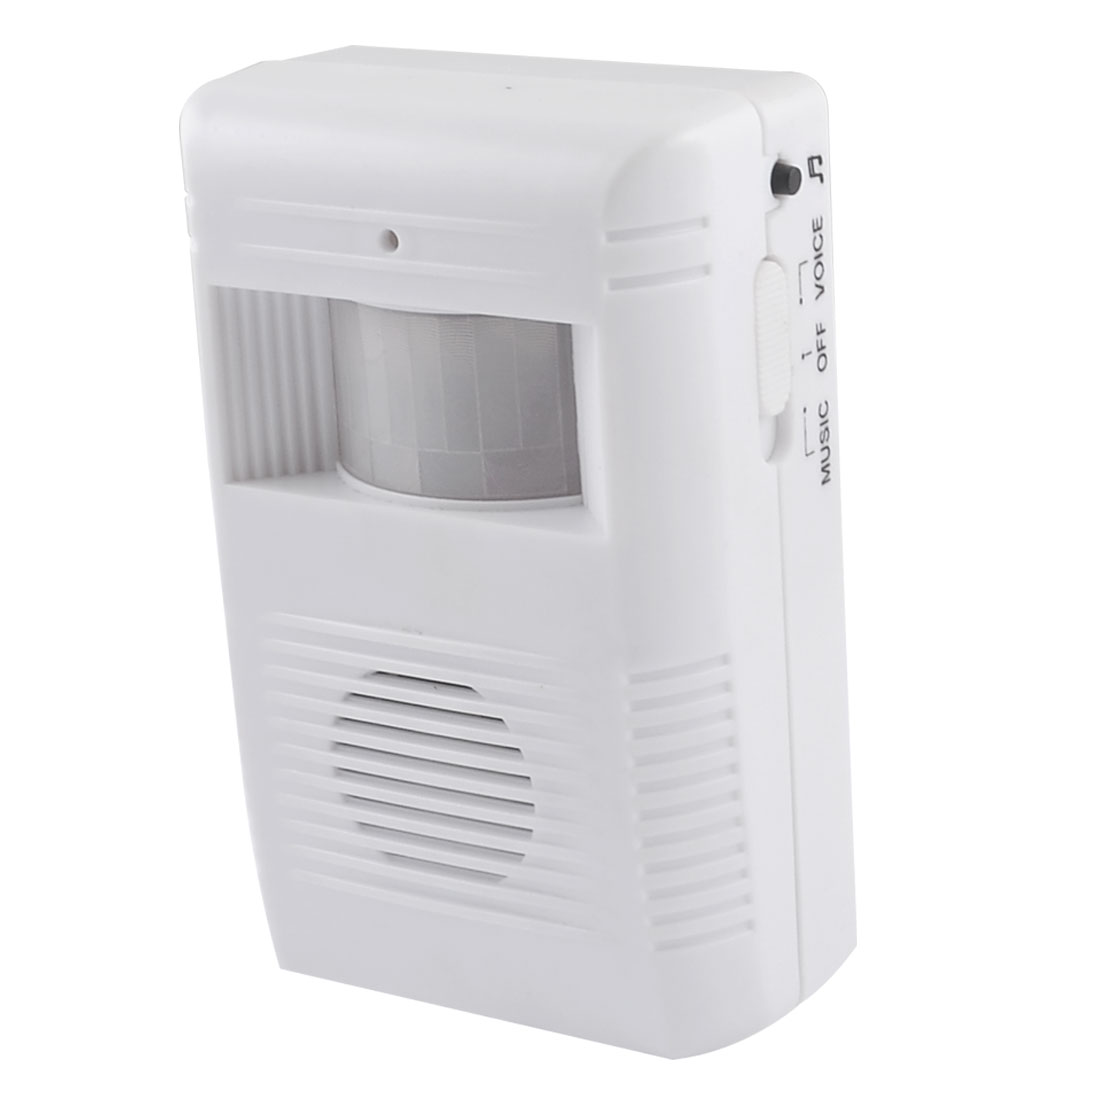 Battery Powered 16 Music Chime Greeting Warning Motion Sensor Wireless Doorbell White